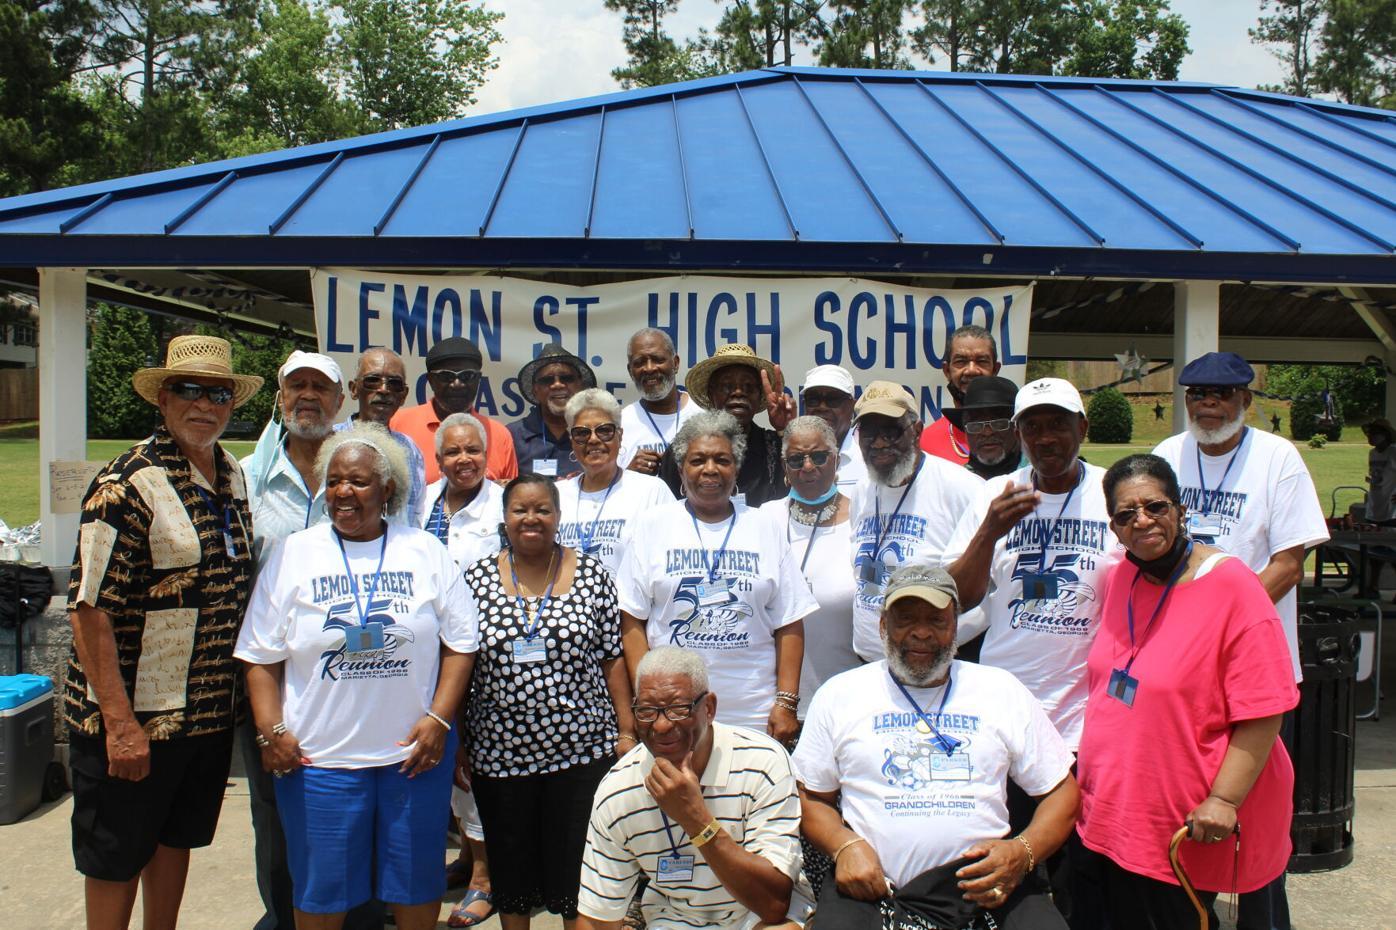 Lemon St. HS class of '66 55th reunion